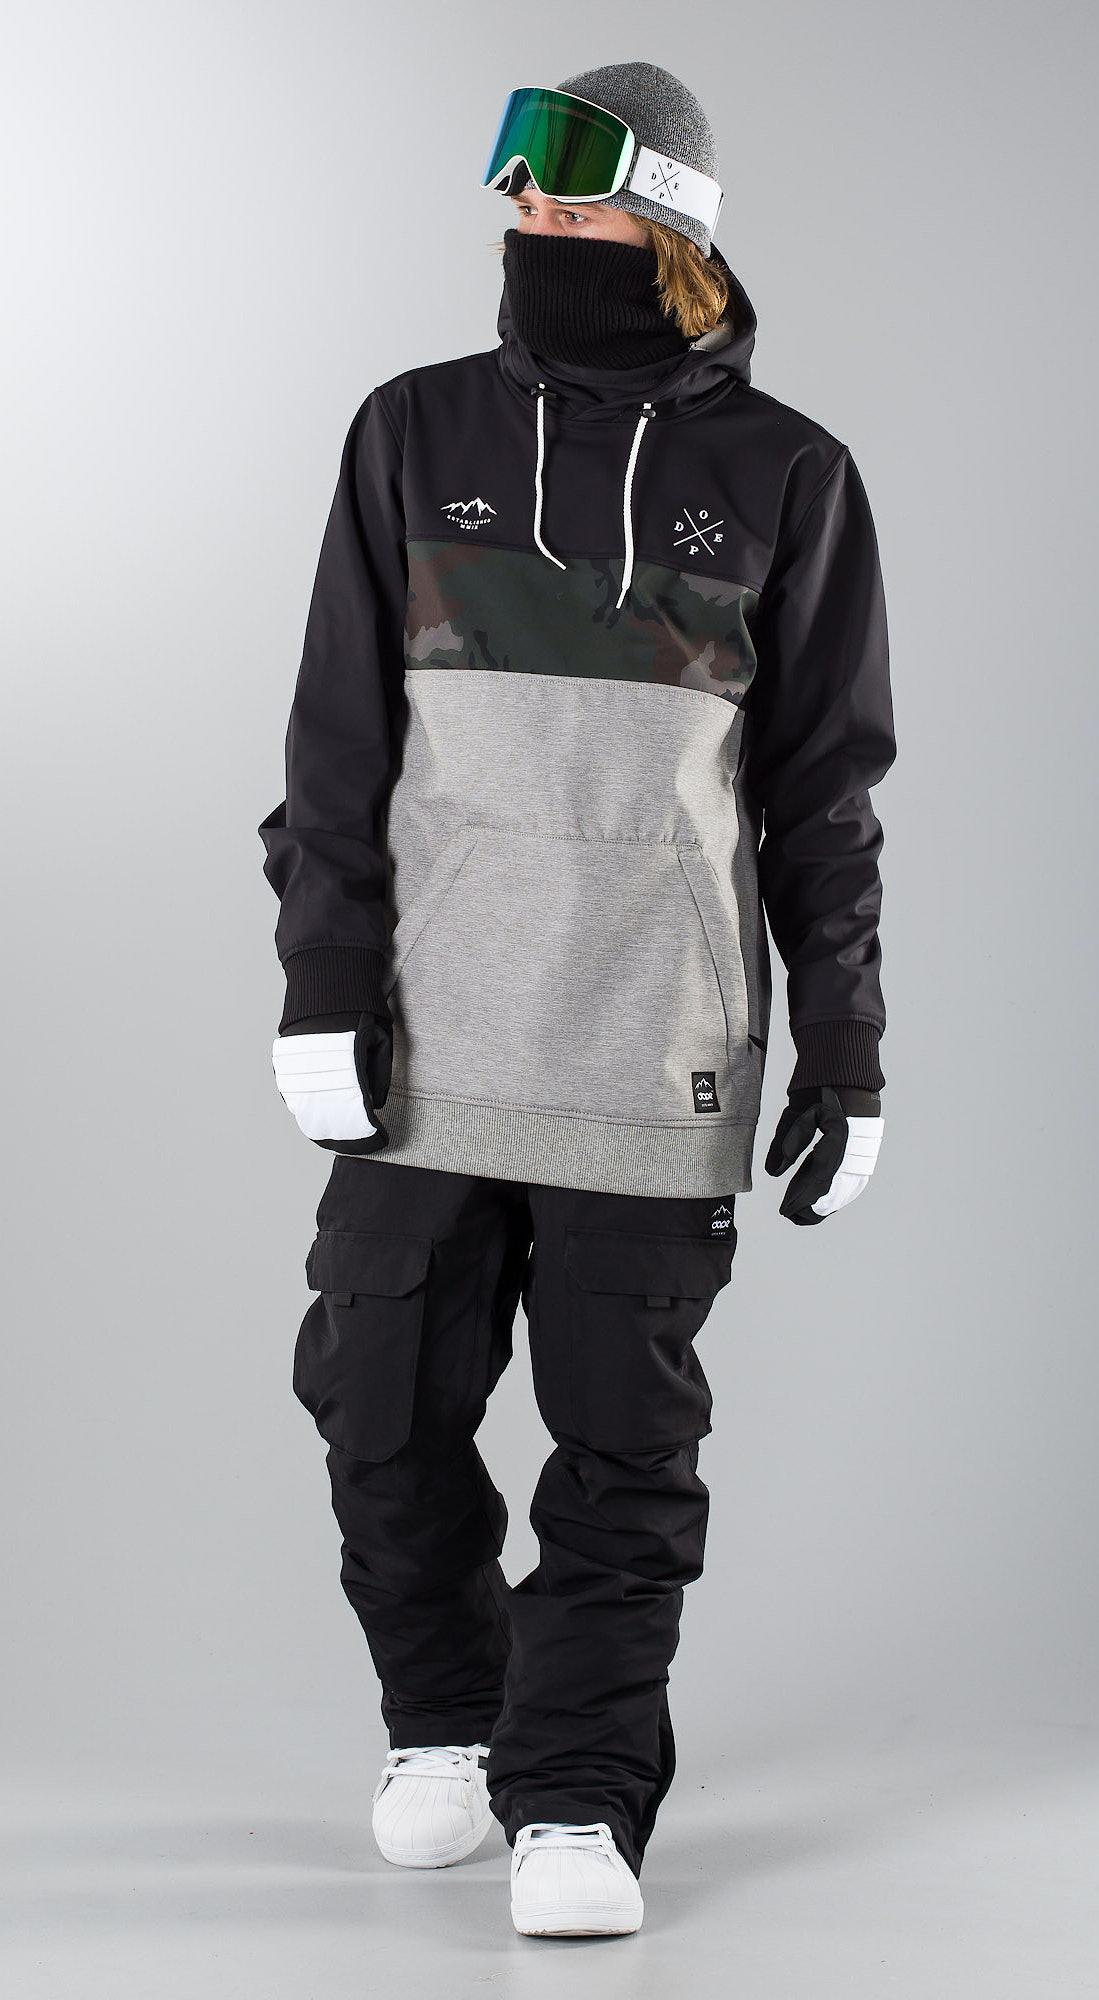 07a64dfa8ce Snowboardkläder herr | Fri frakt | Stort sortiment | Ridestore.se